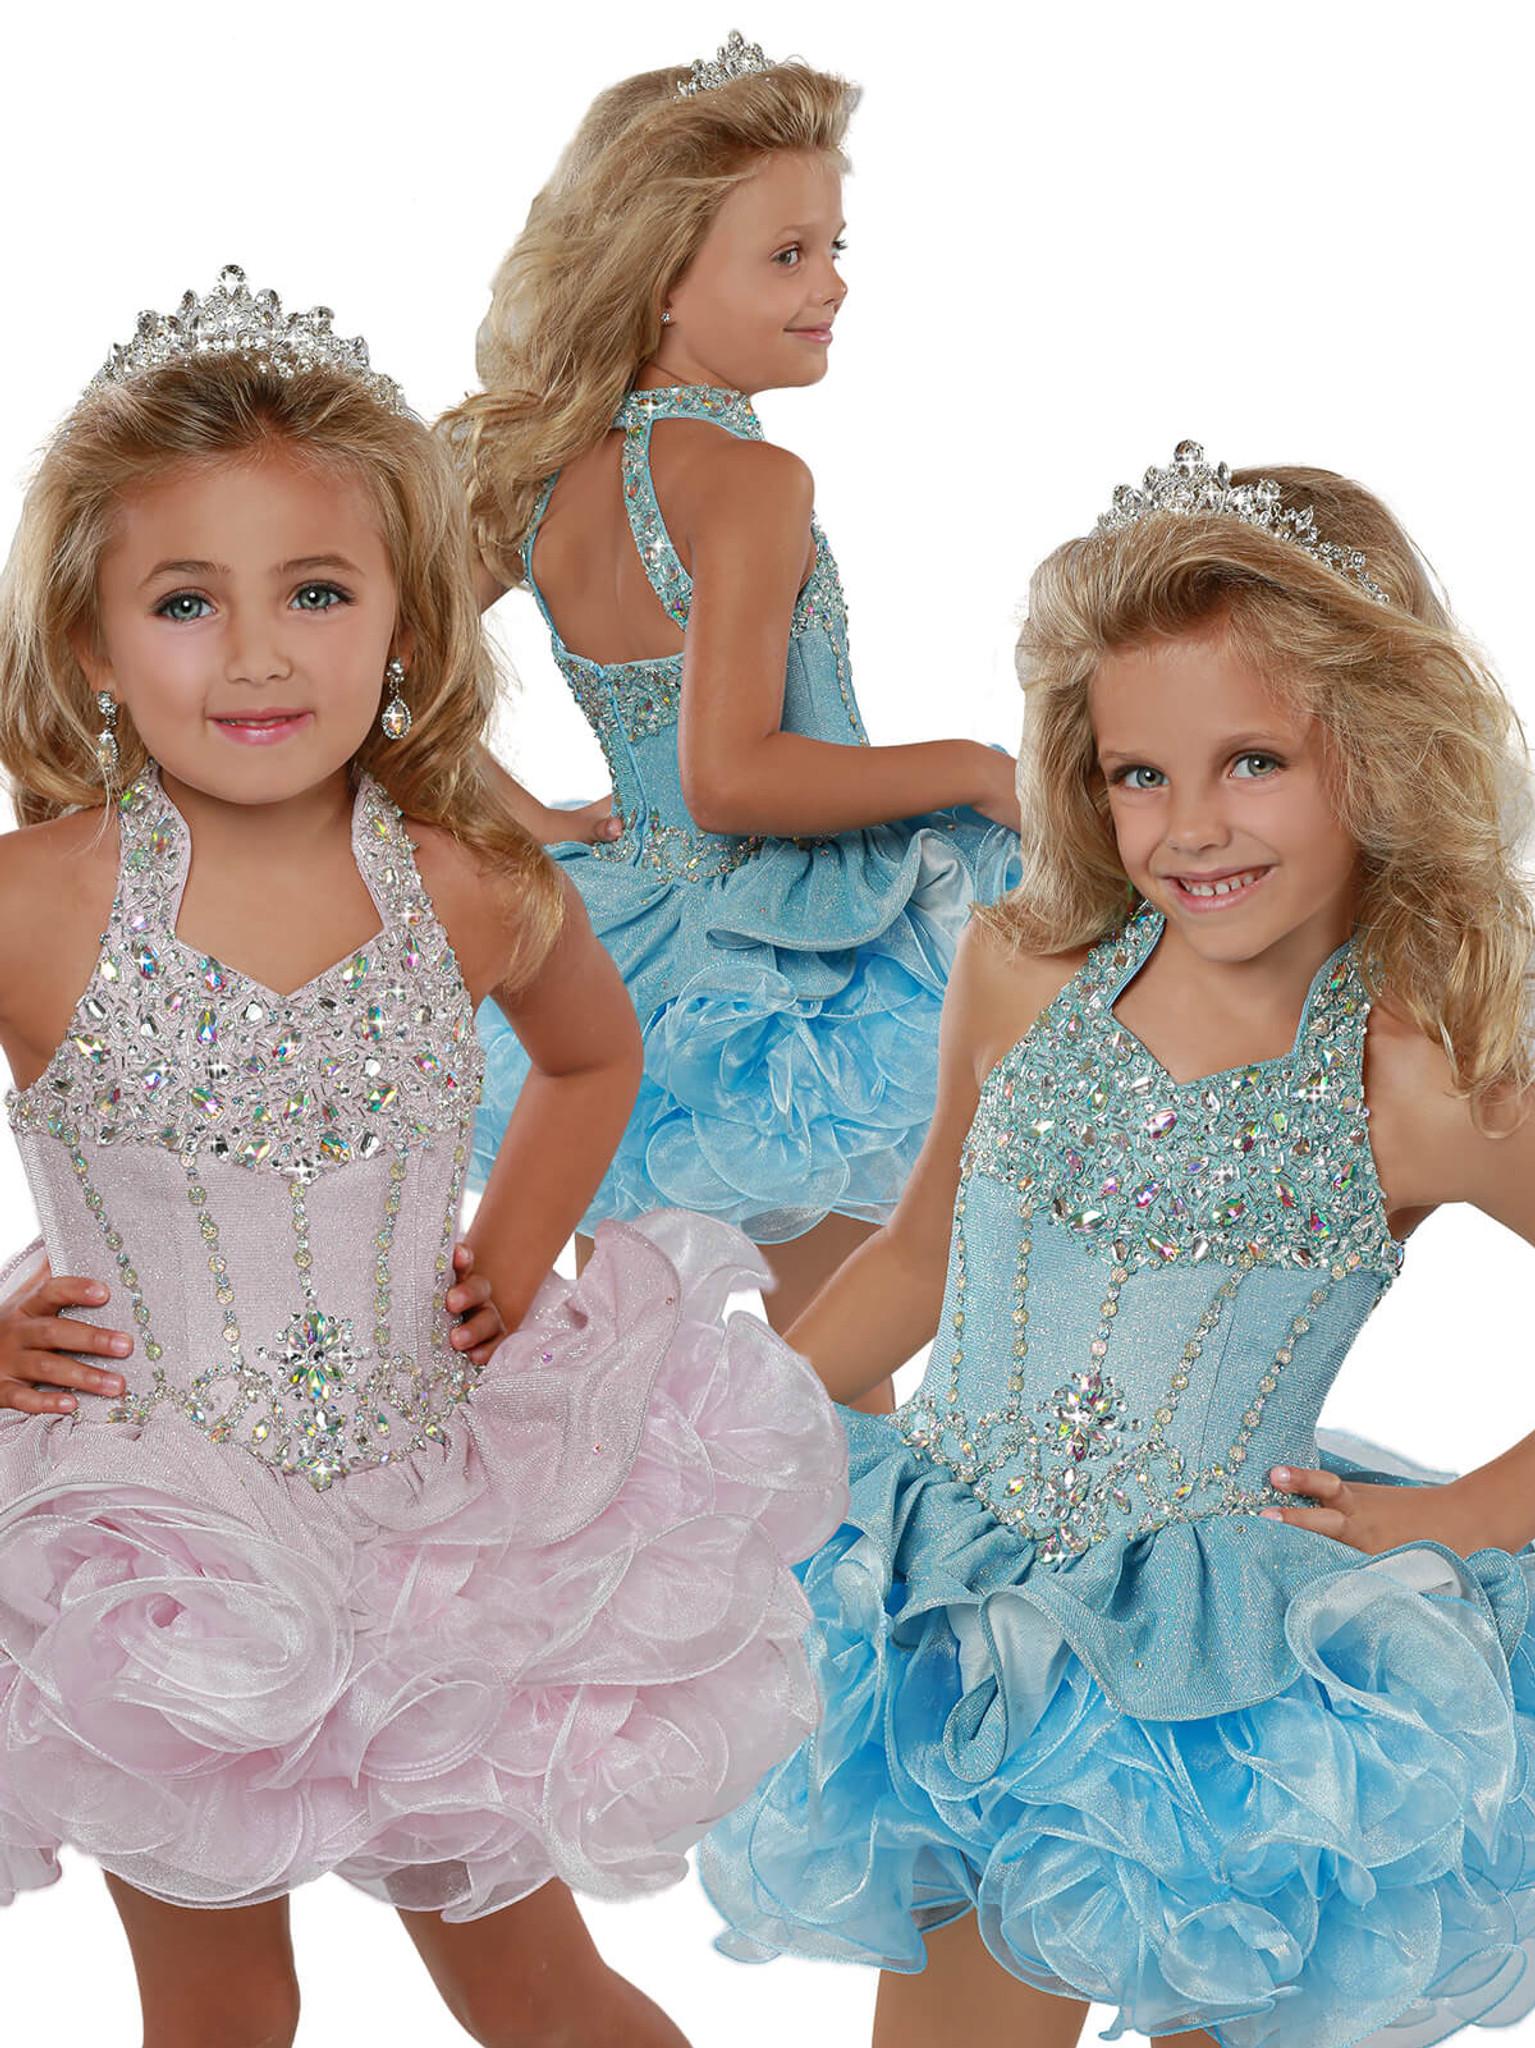 Cupcake Ritzee Girls B282 Pageant Dress PageantDesigns